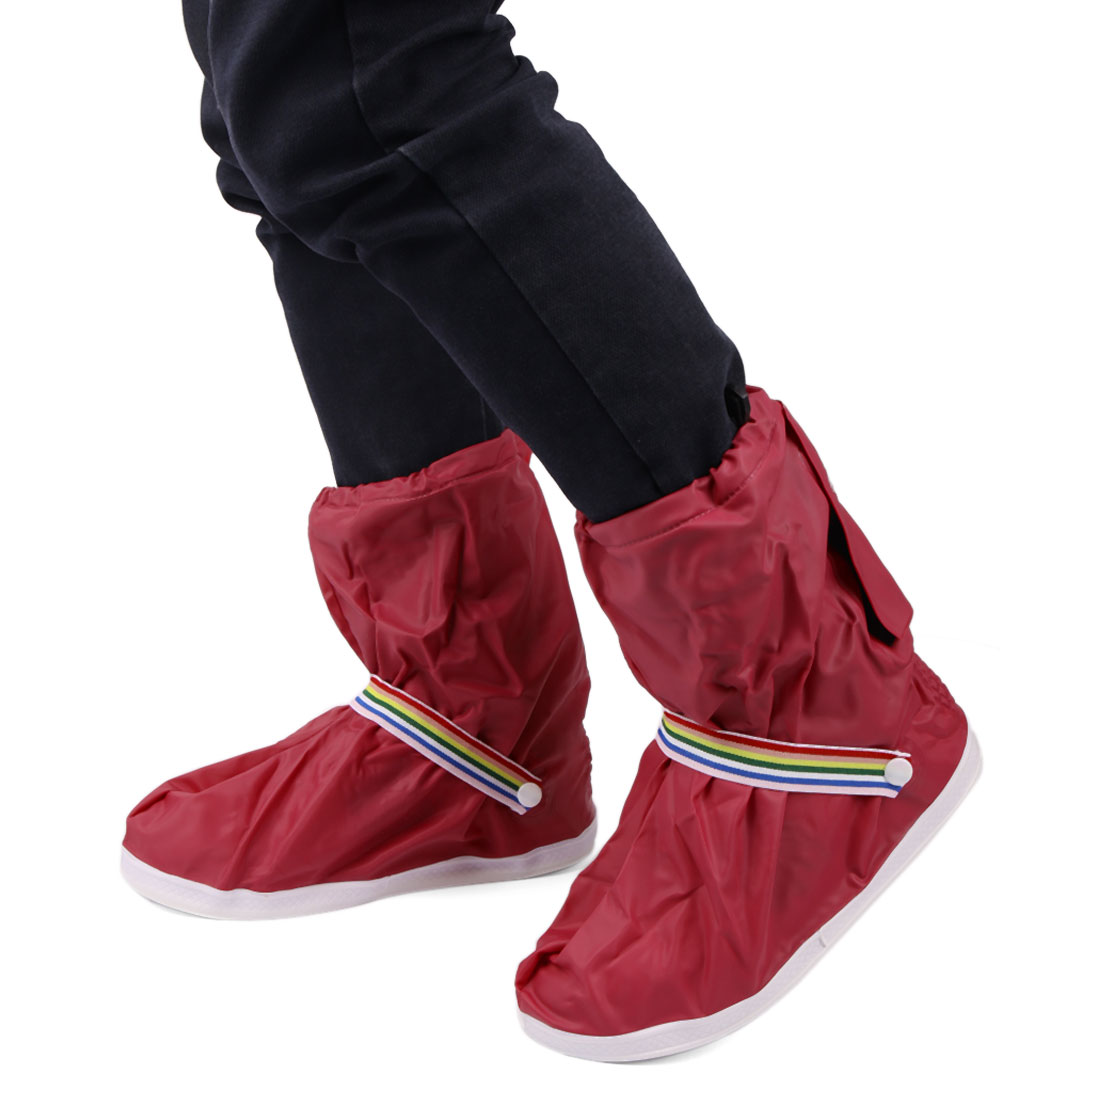 1Pair Wine Red Motorcycle Nonslip Waterproof Adjustable Rain Shoes Boot Cover XL - image 4 de 5